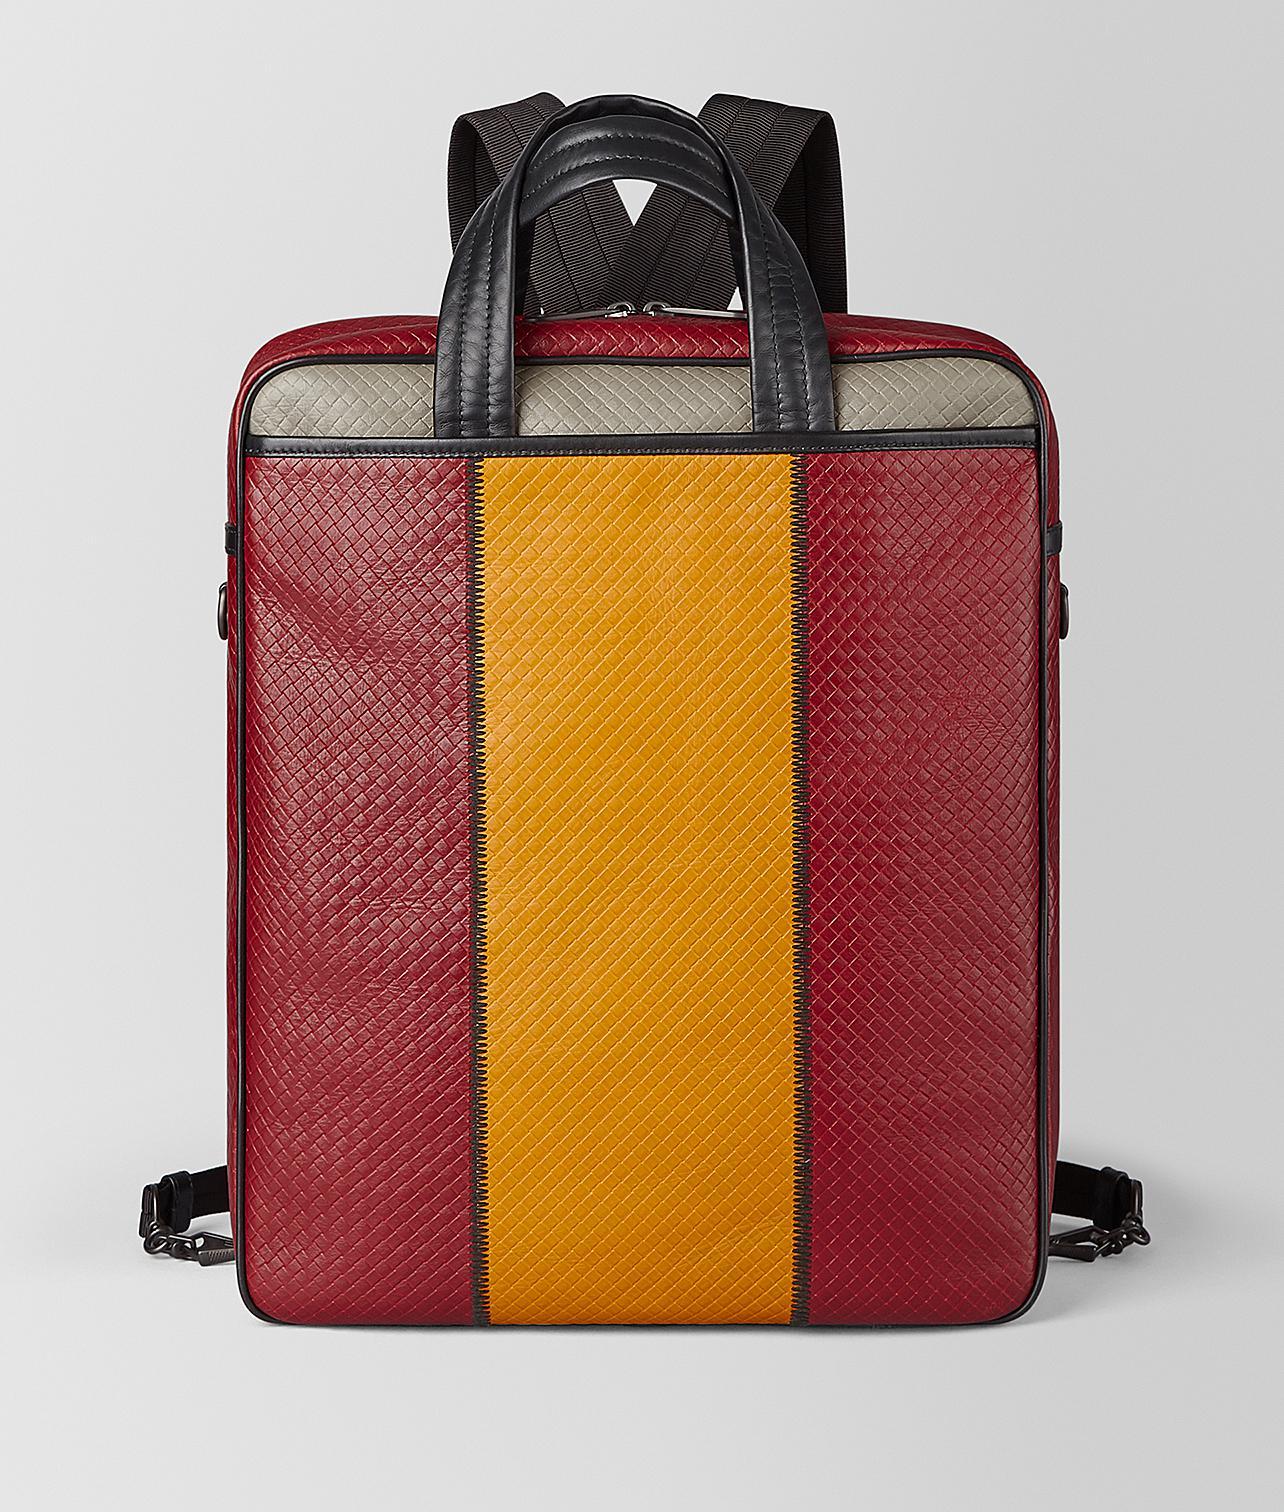 Lyst - Bottega Veneta Backpack In Micro-intrecciato Embossed for Men f4084d4192b36